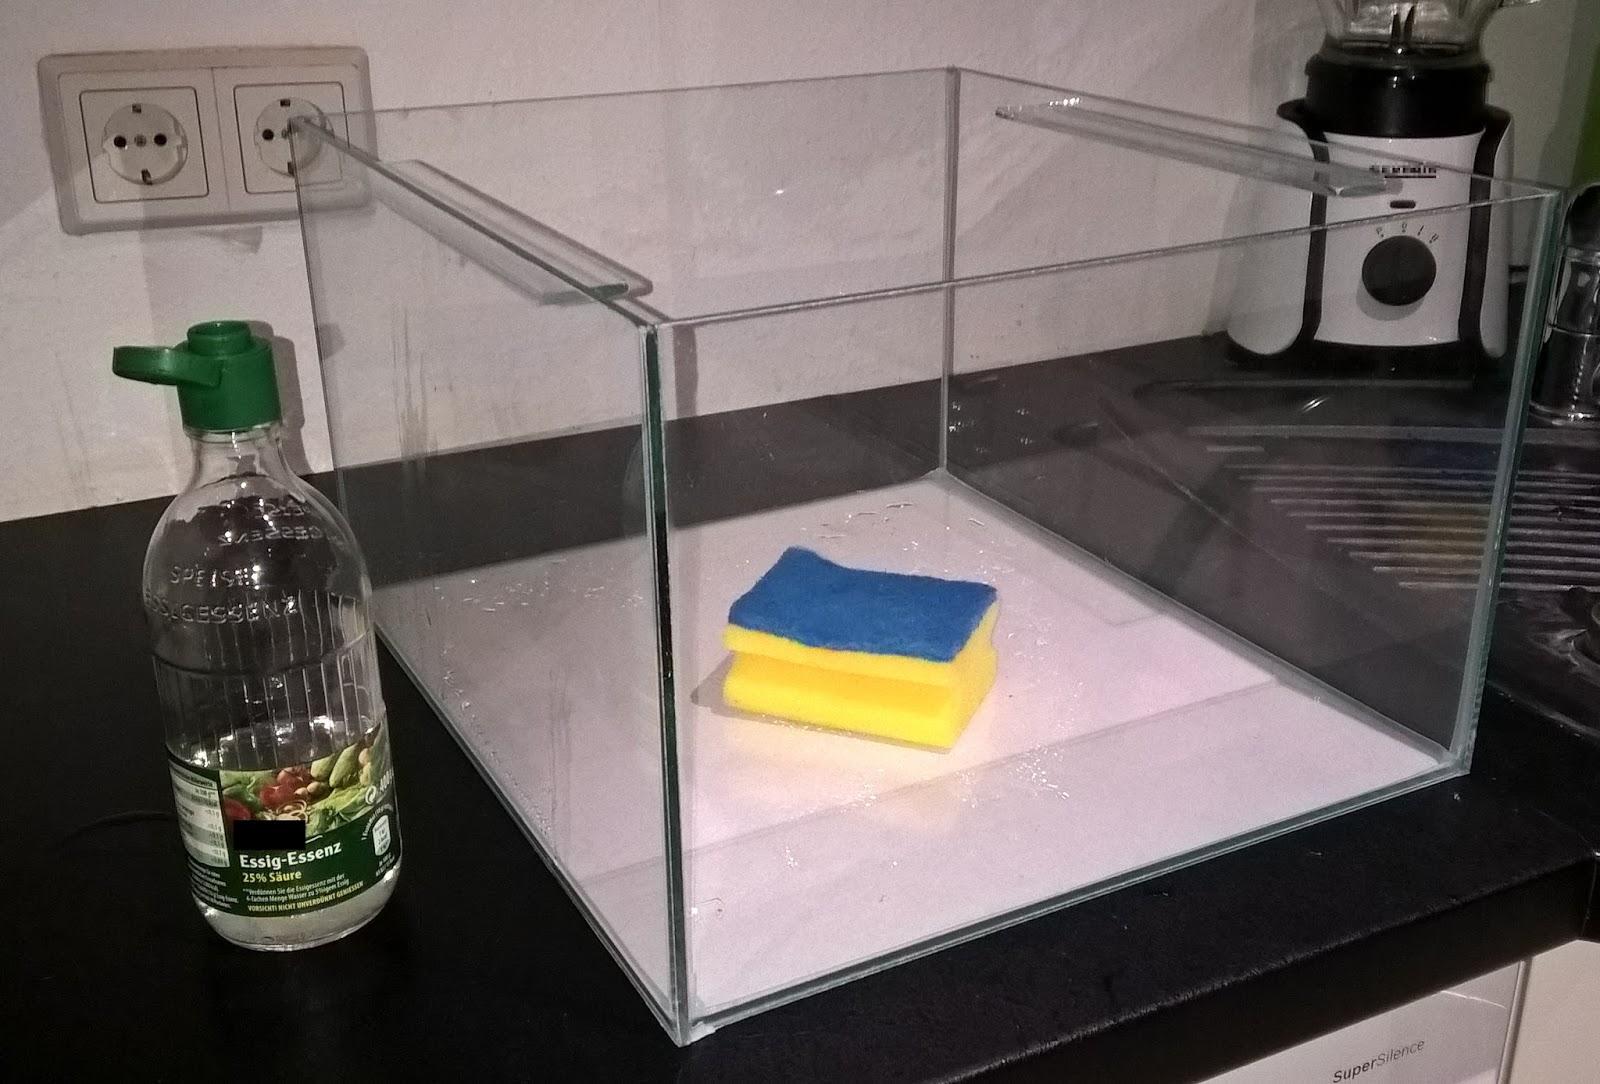 ikea expedit aquarienanlage garnelenforum. Black Bedroom Furniture Sets. Home Design Ideas